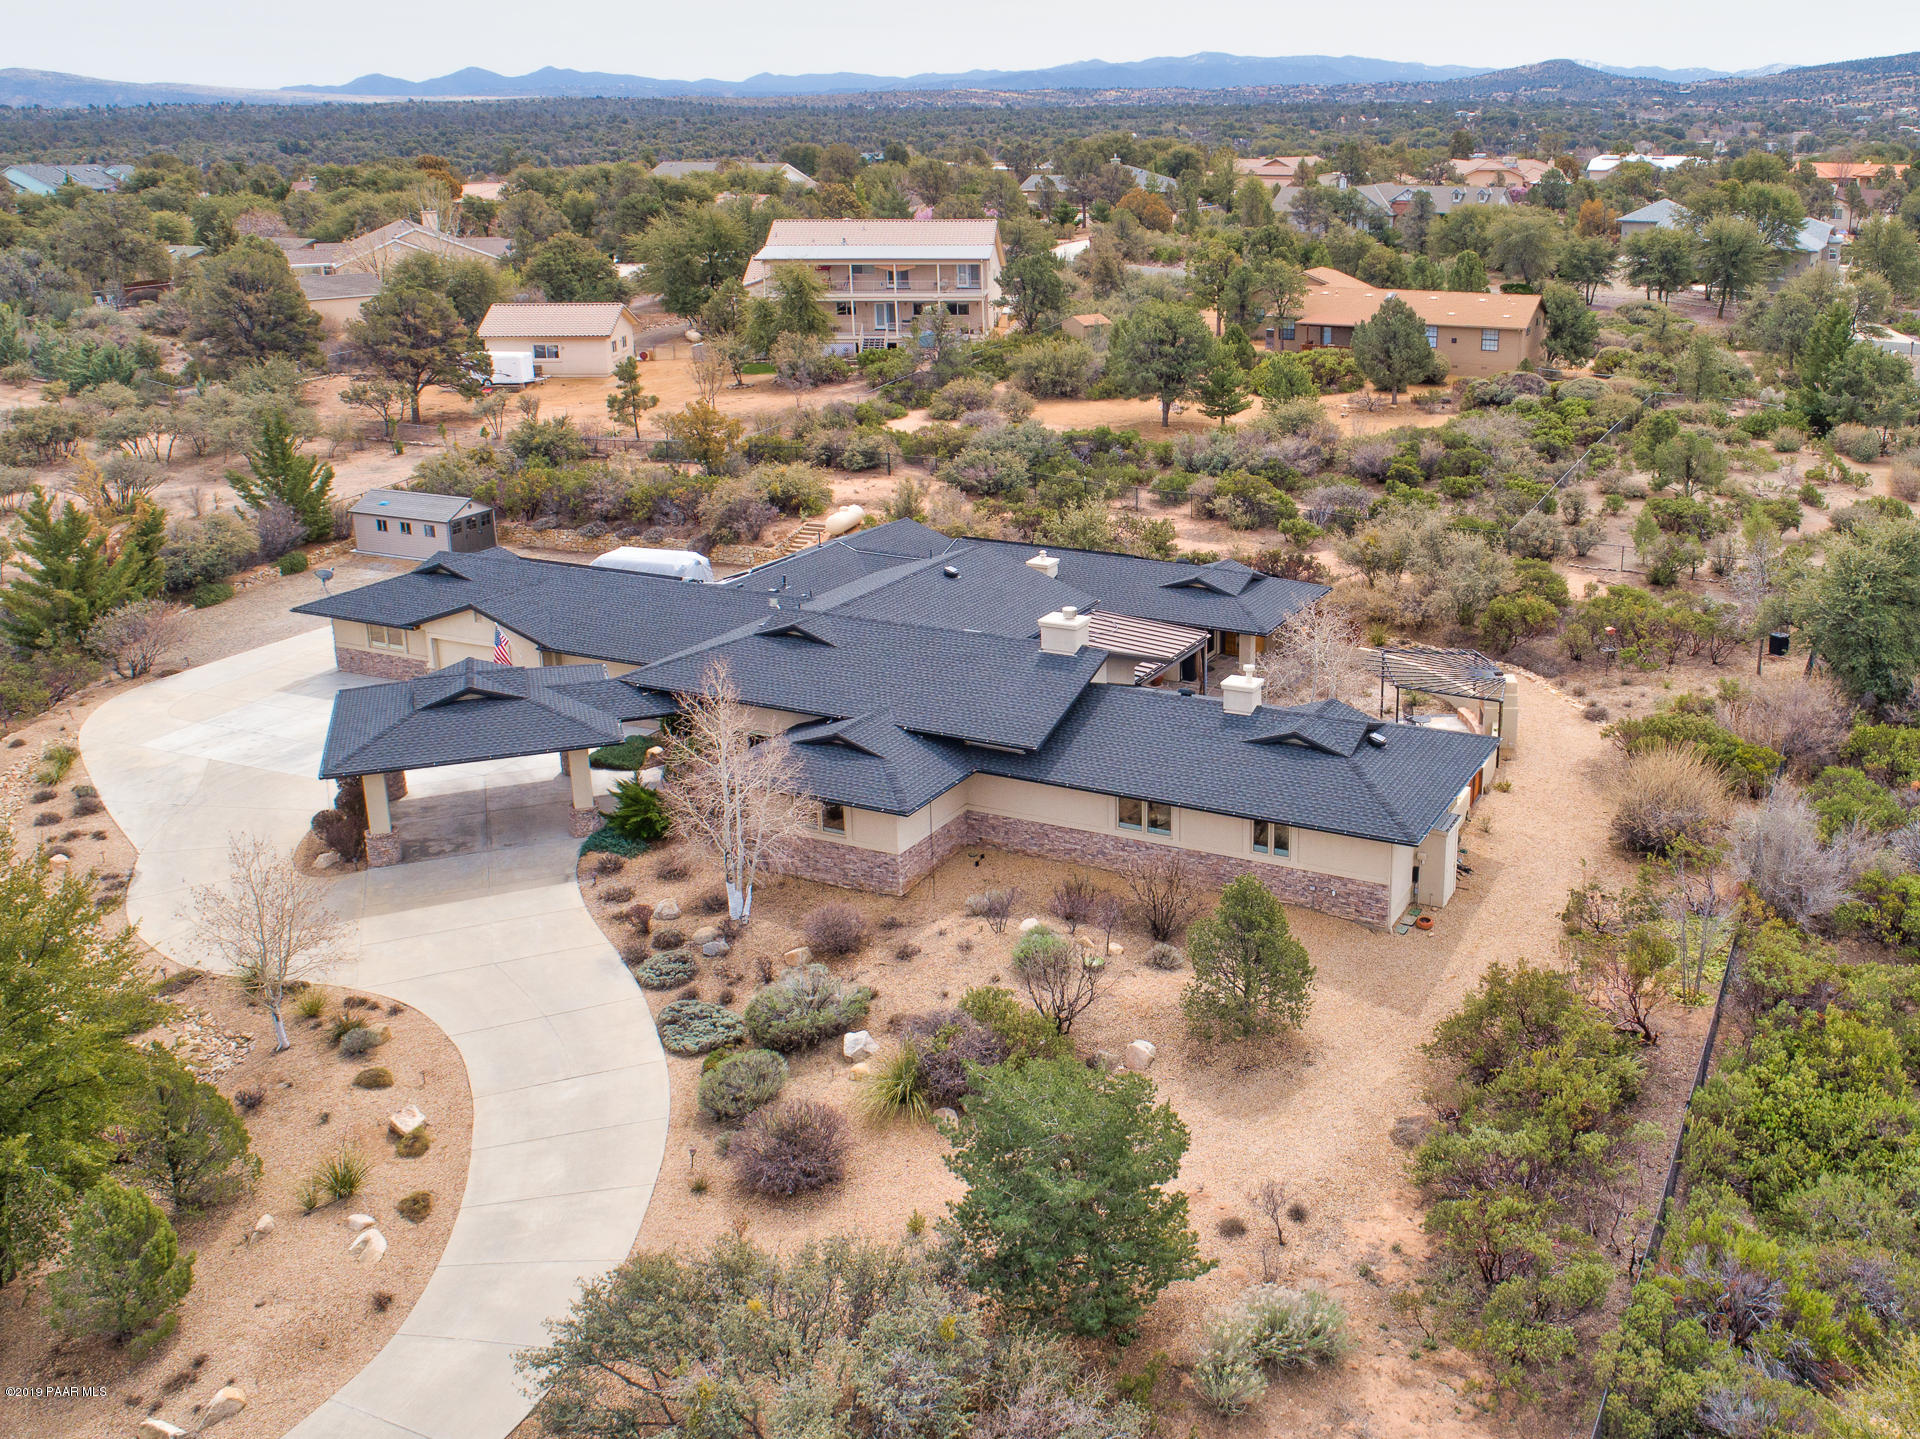 Photo of 2331 Post Oak, Prescott, AZ 86305